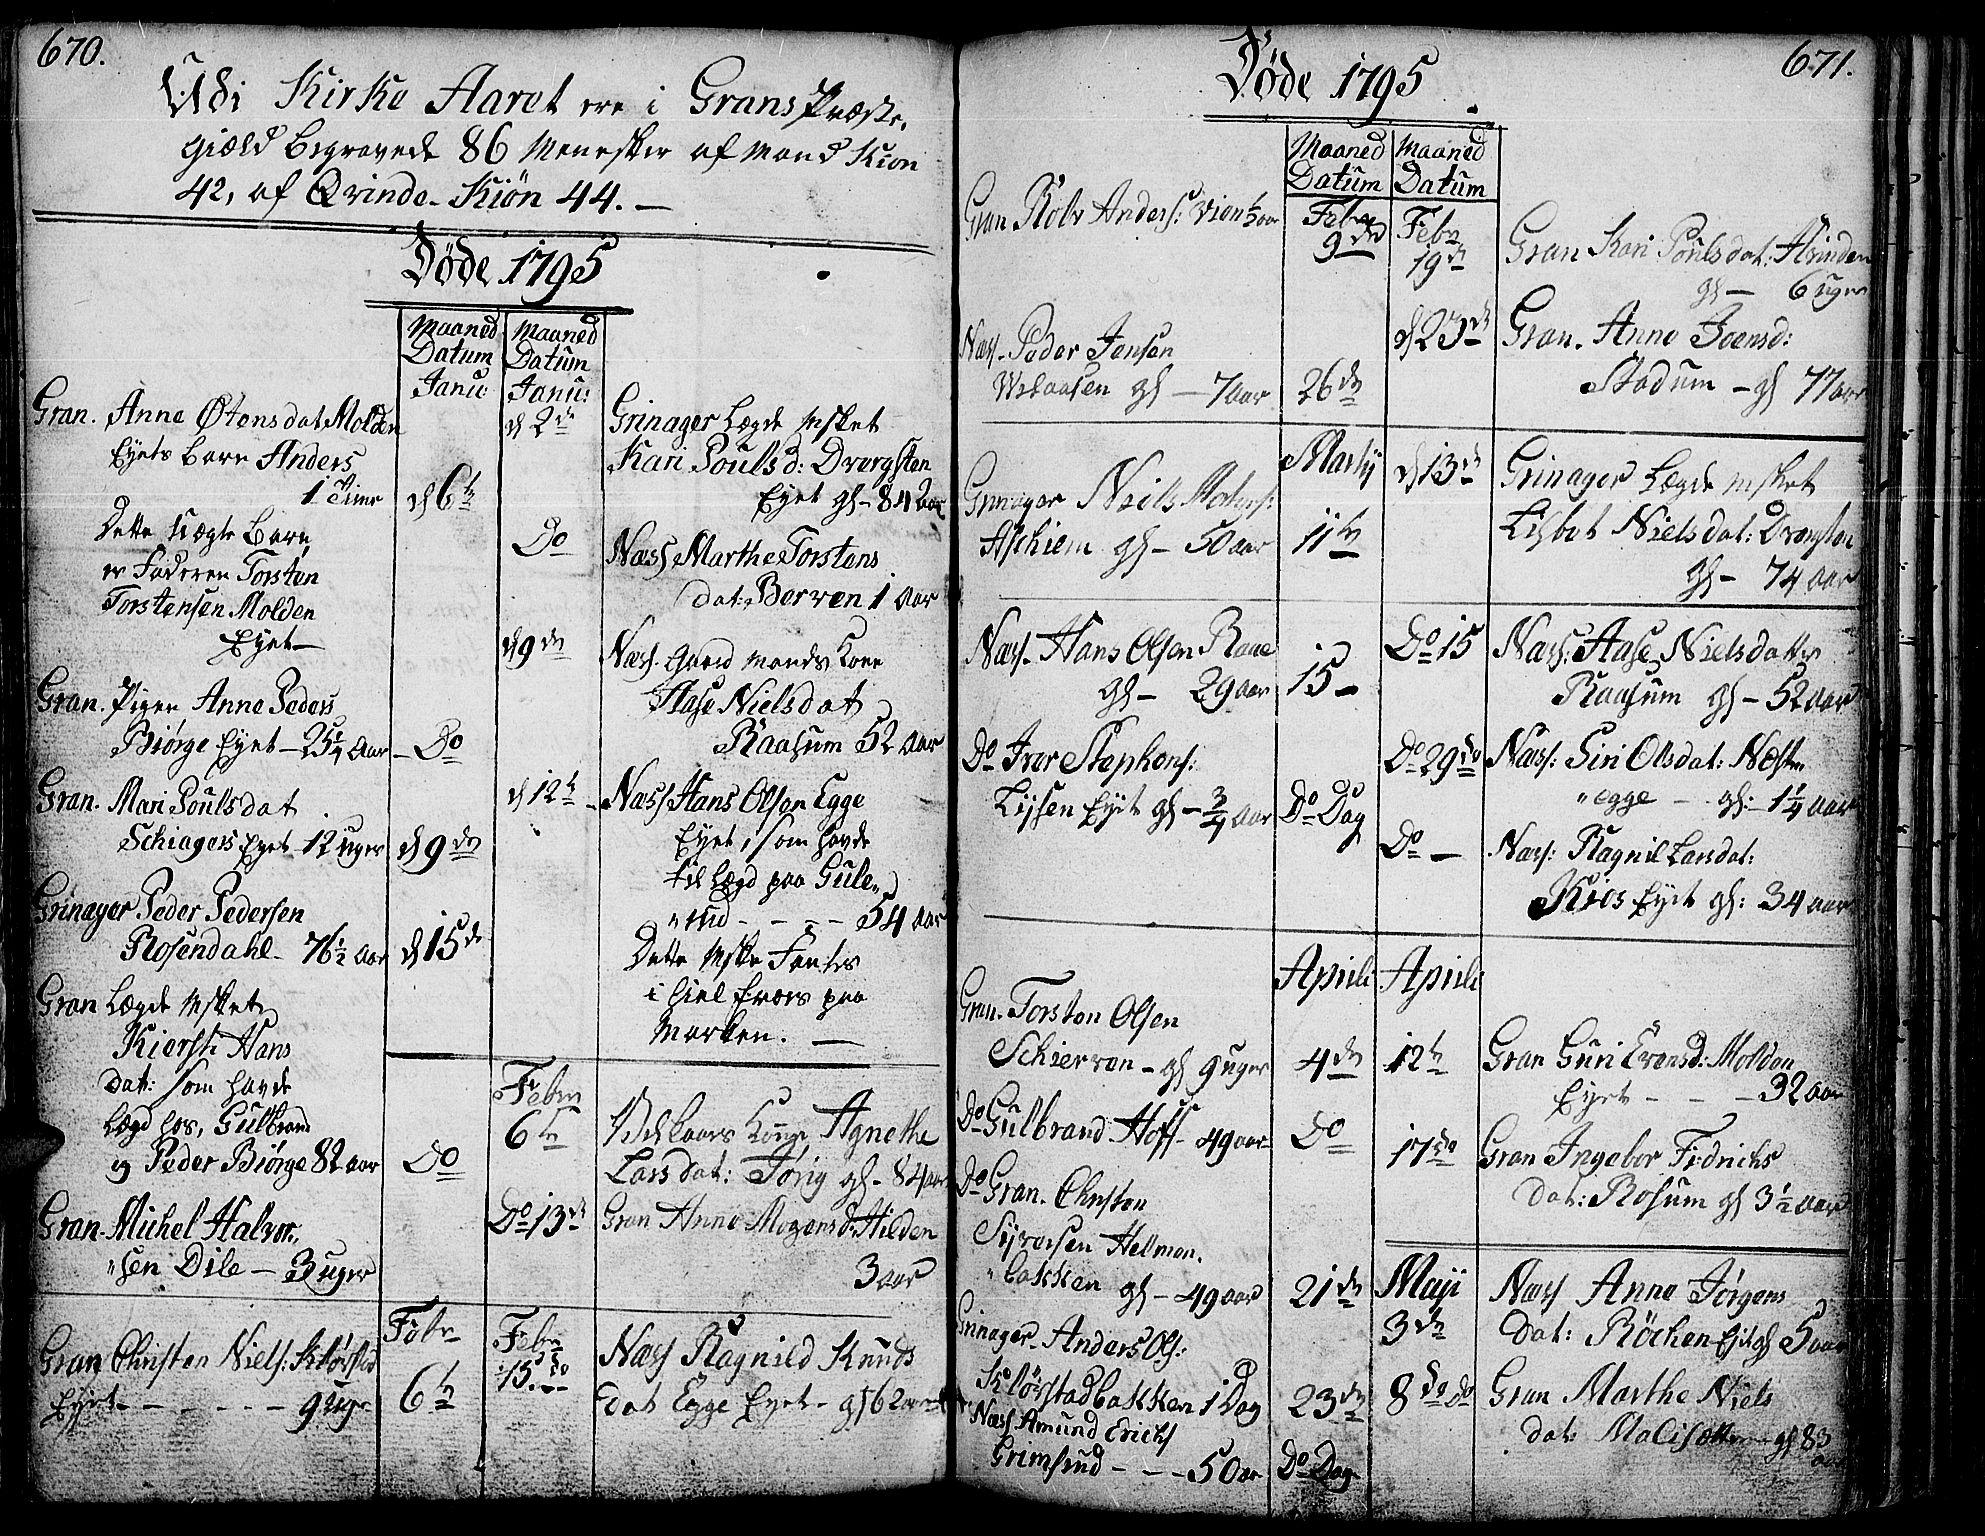 SAH, Gran prestekontor, Ministerialbok nr. 6, 1787-1824, s. 670-671